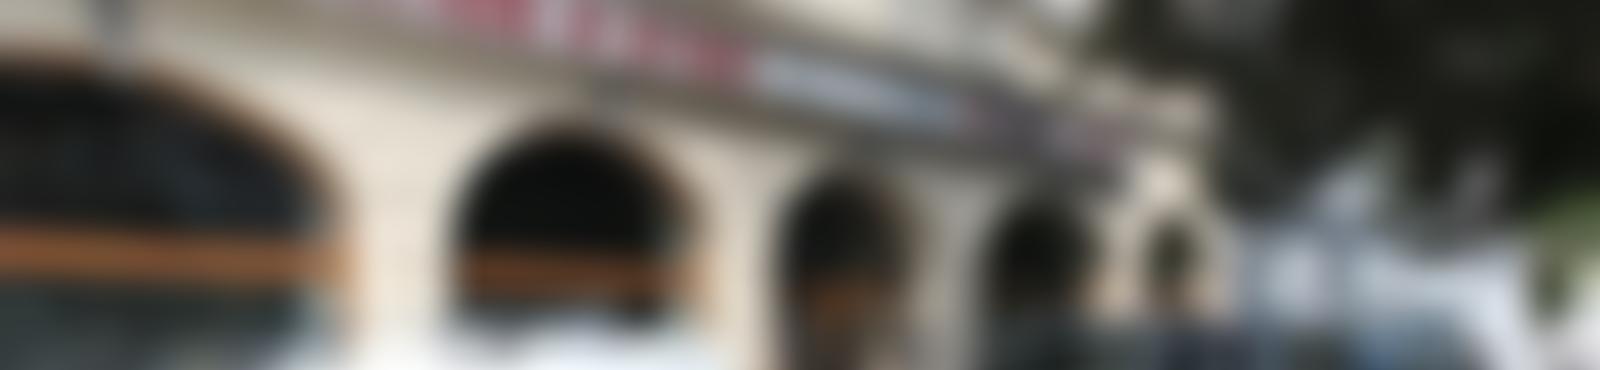 Blurred maximkino